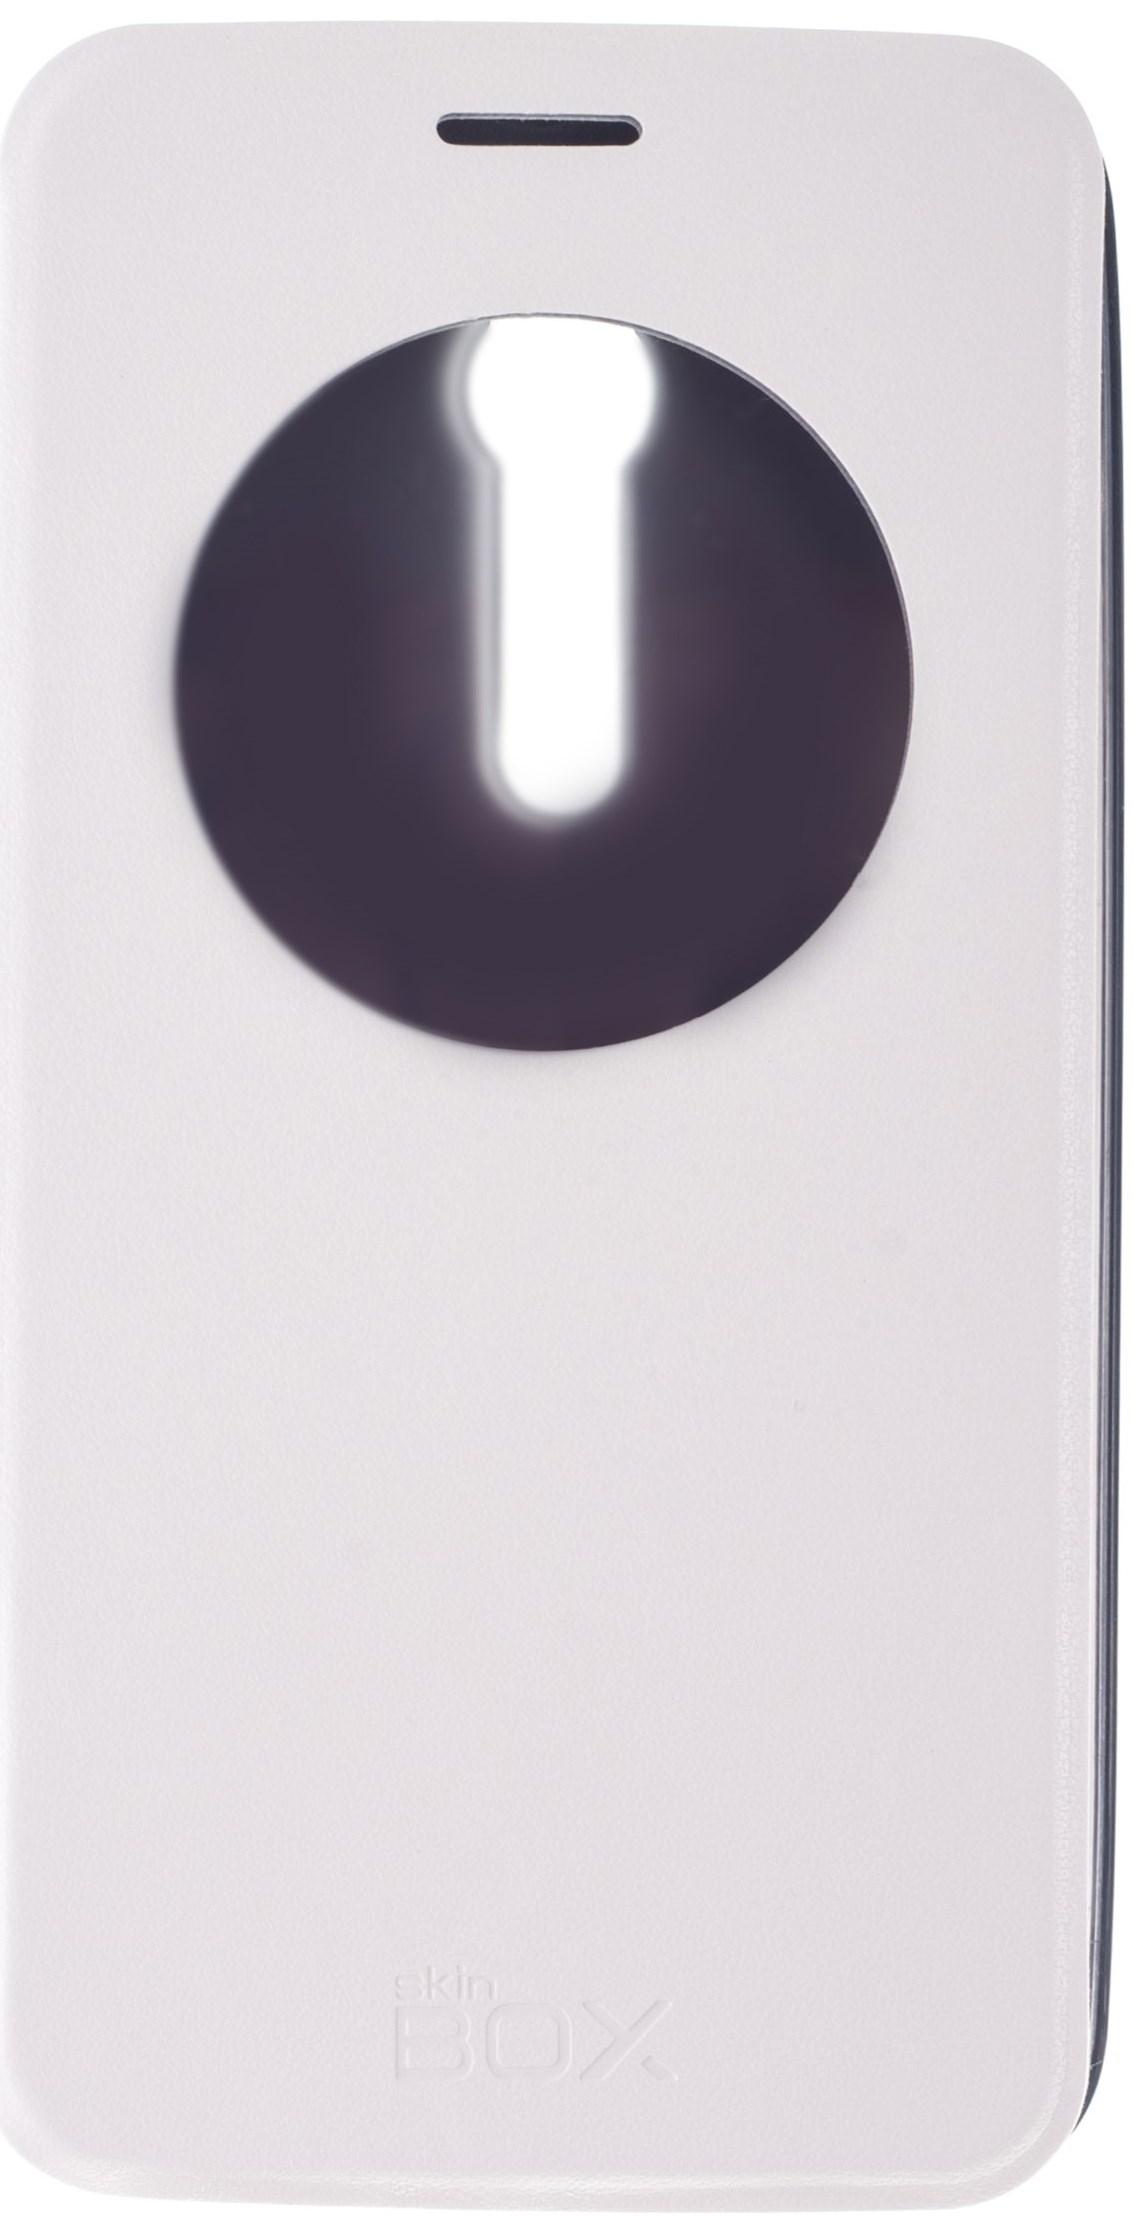 Чехол skinBOX Lux AW для Asus ZenFone 2 ZE550MLZE551ML белый